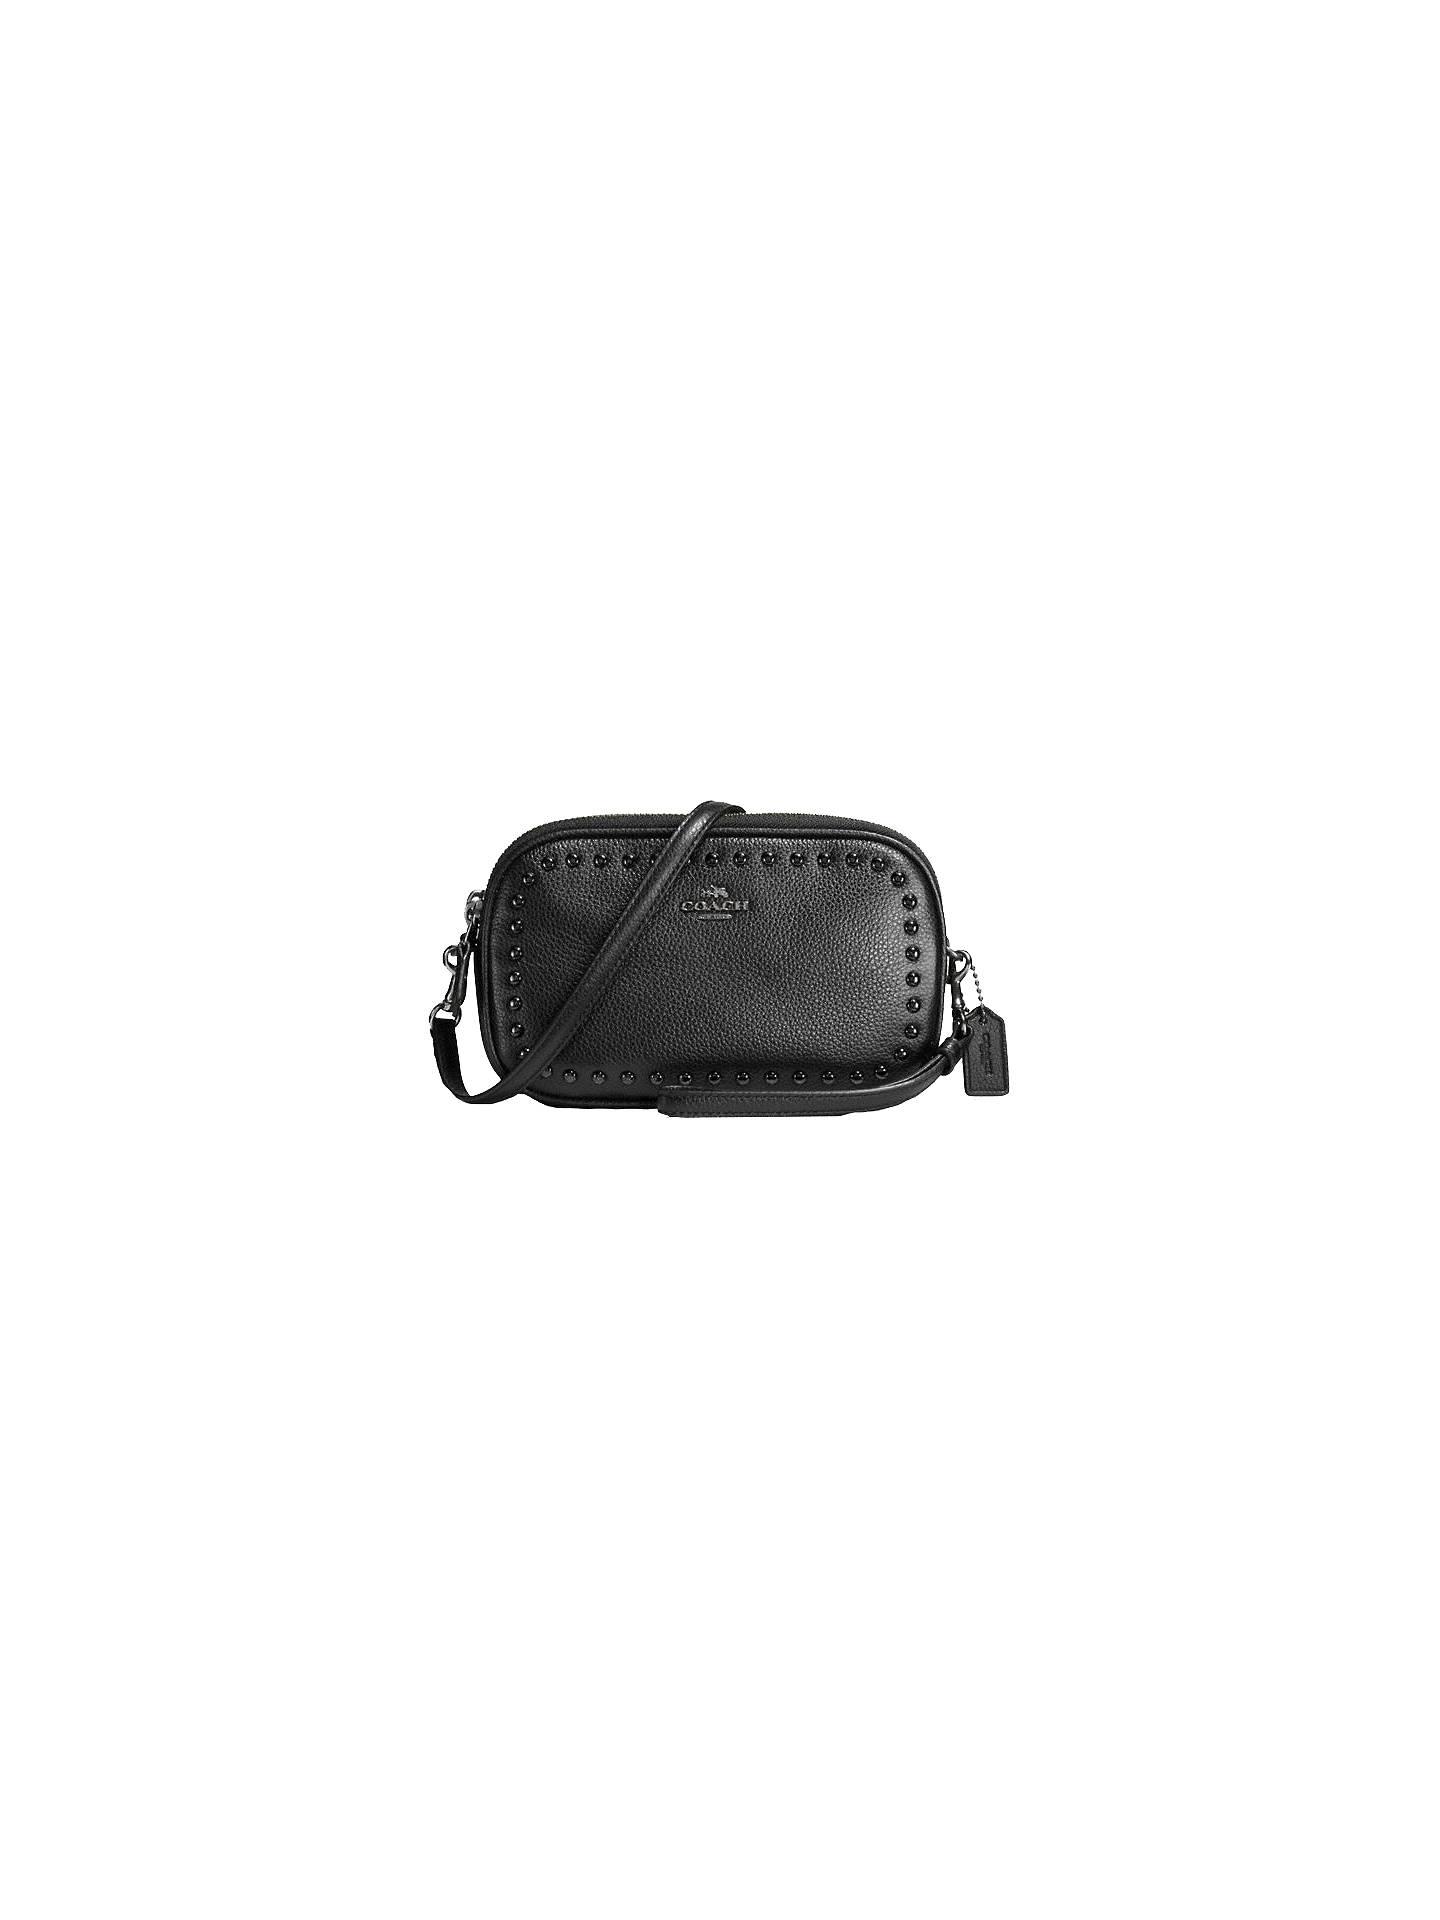 81d9061a9 Buy Coach Rivets Leather Cross Body Clutch Bag, Black Online at  johnlewis.com